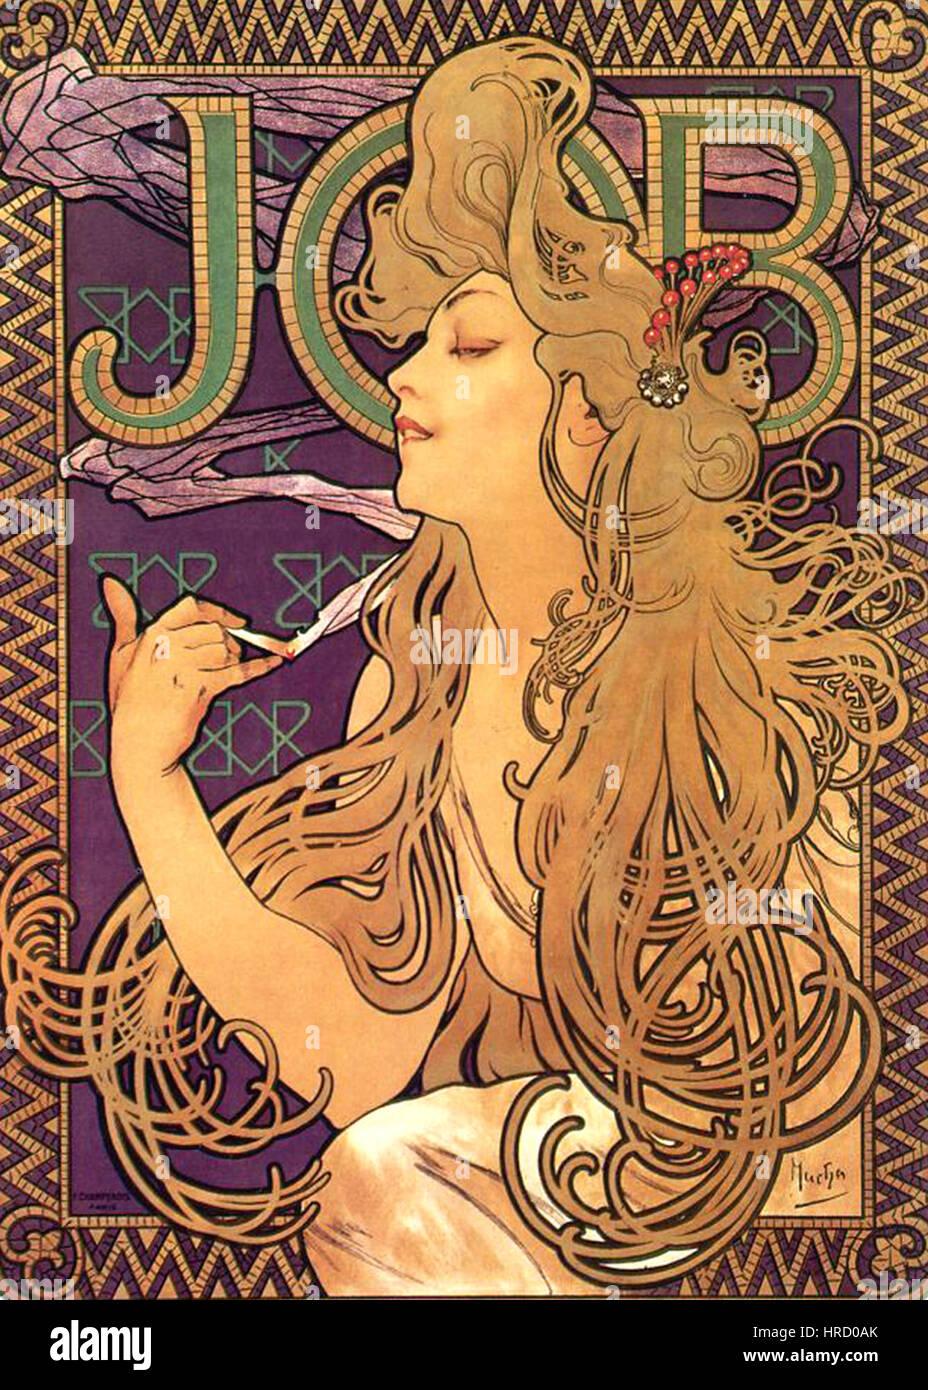 Alphonse Mucha - Job Cigarettes 1 - Stock Image